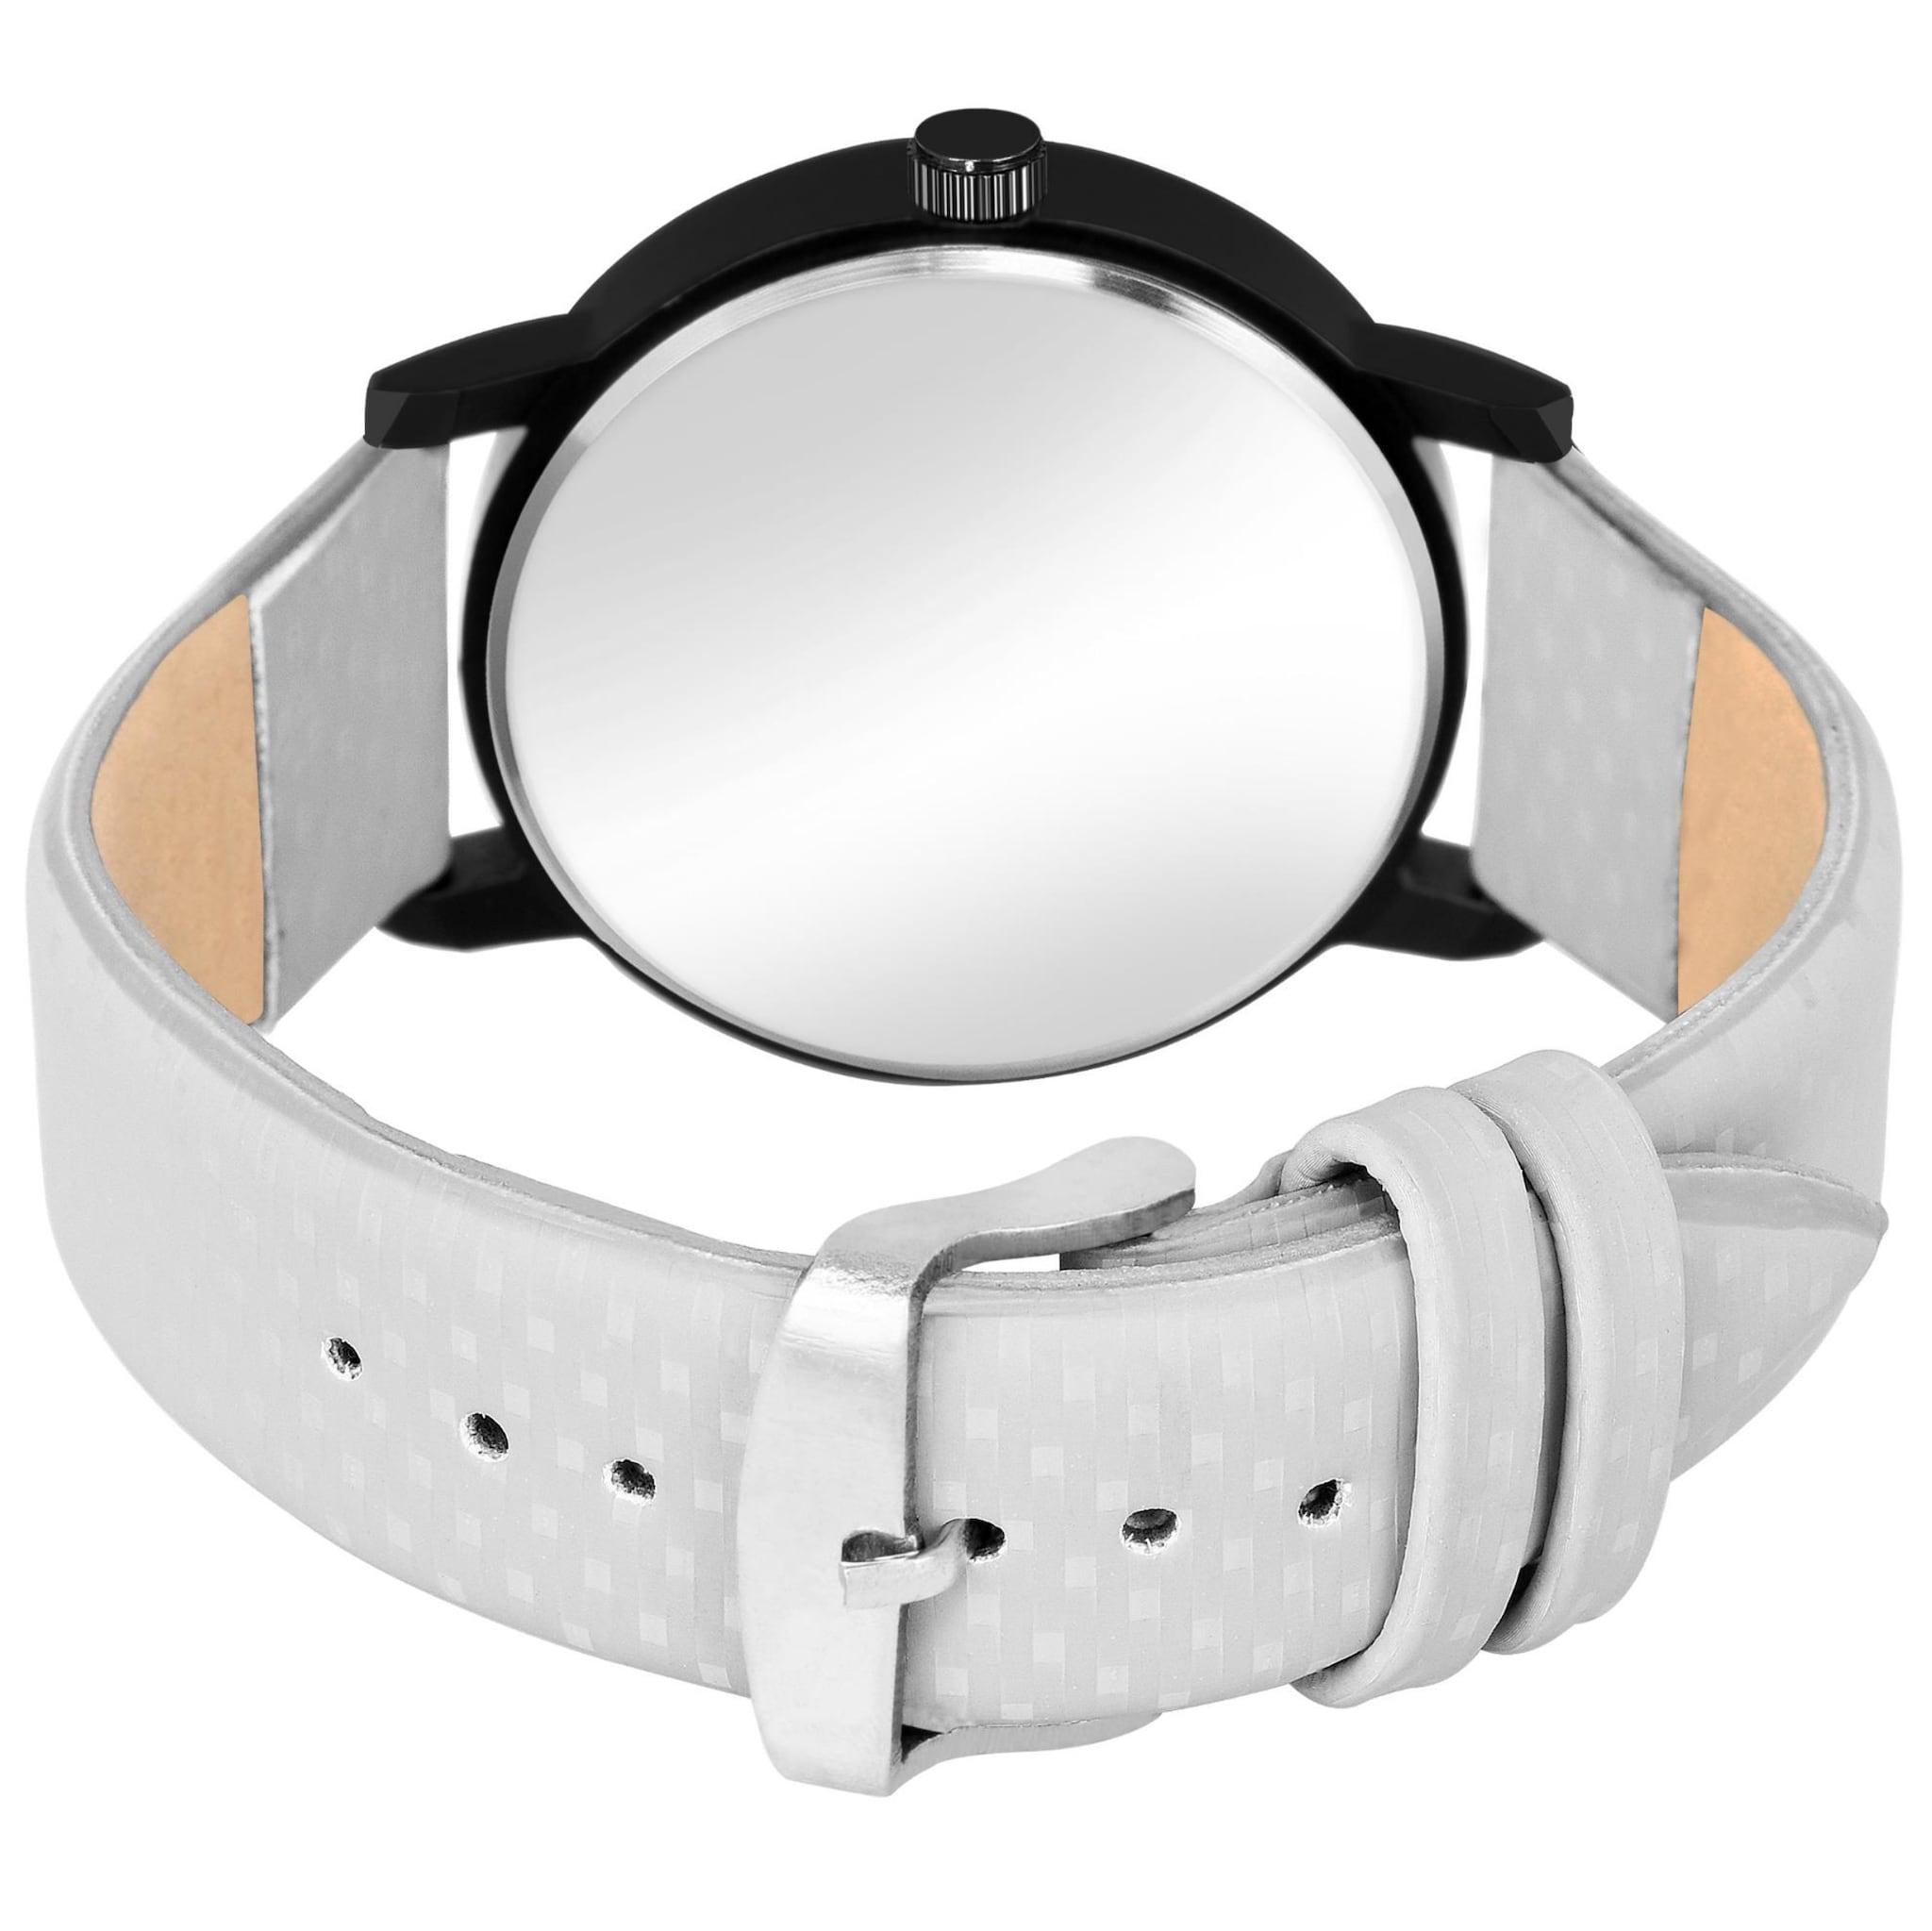 Fashion Now New Look Formal Men Wrist Watch (Black)